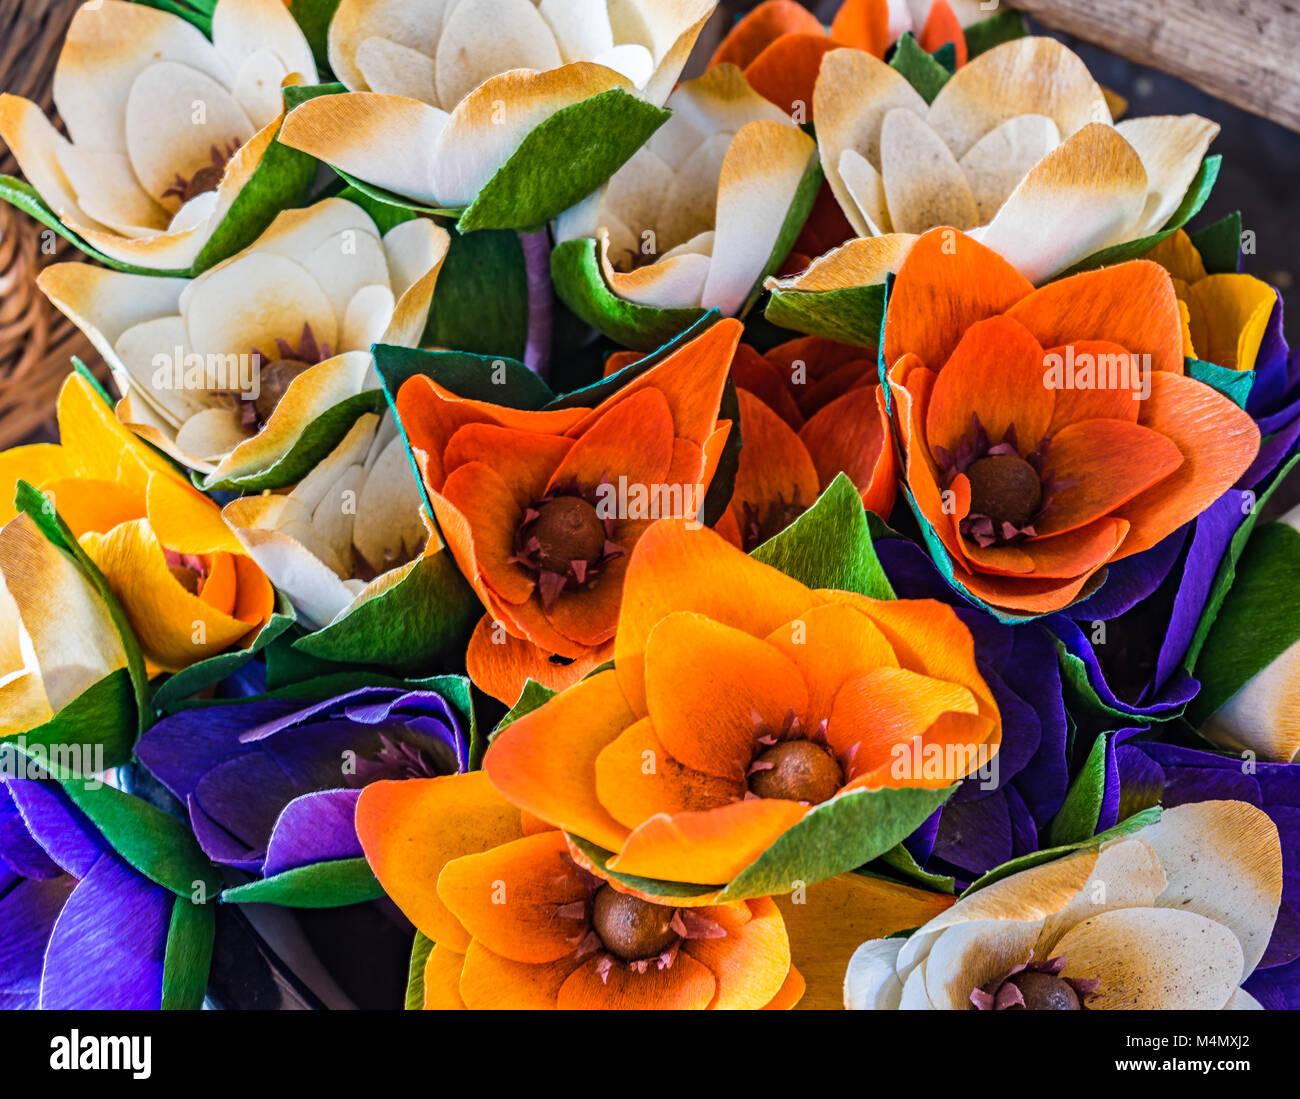 Papaveri Di Carta Crespa fiori di carta crespa immagini e fotos stock - alamy